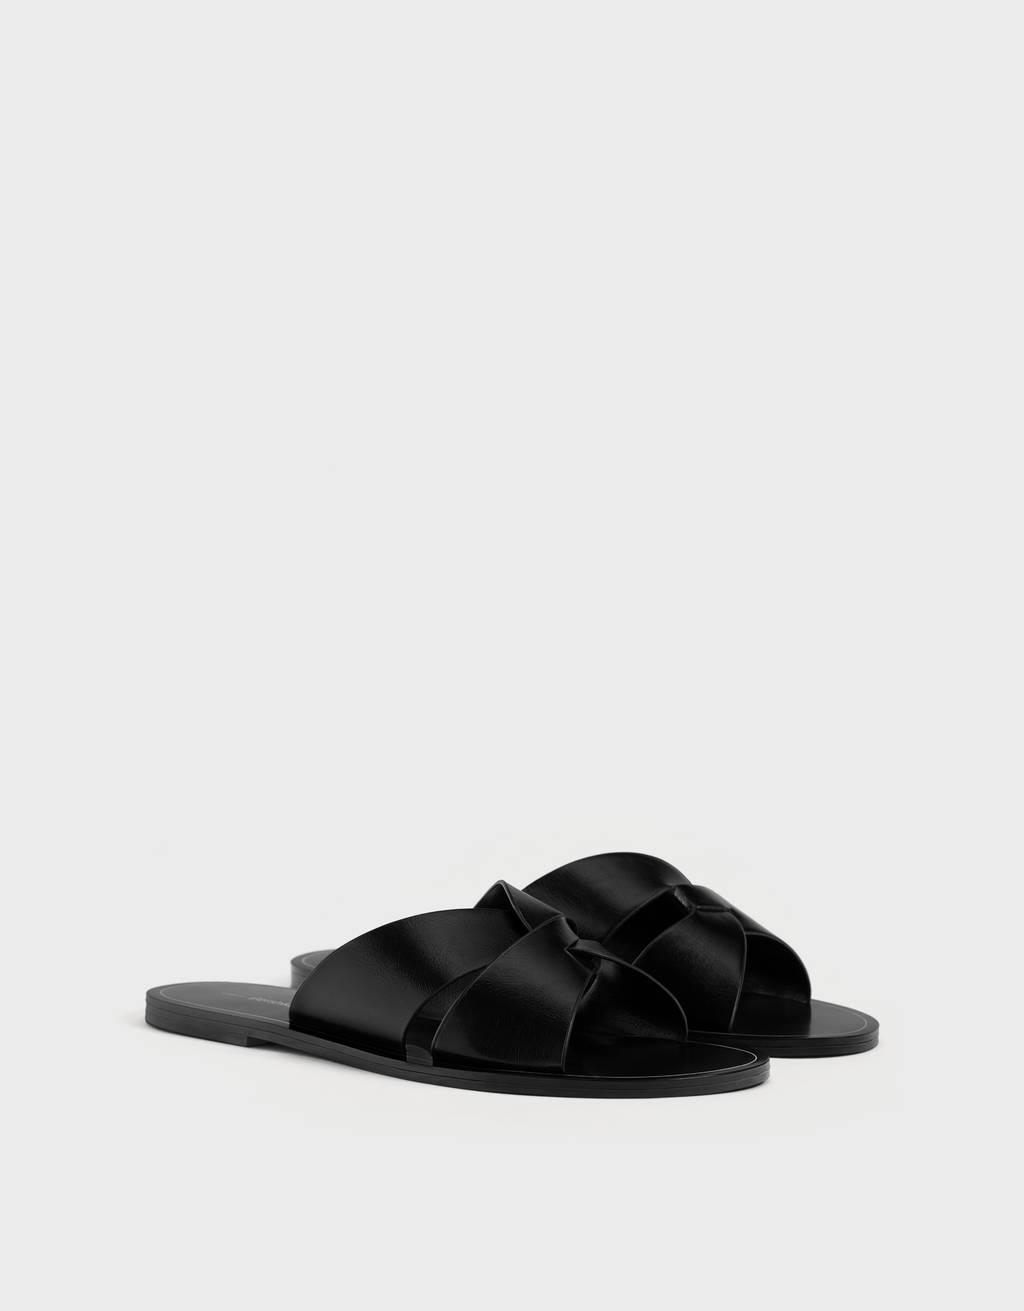 Ristrihmadega sandaalid